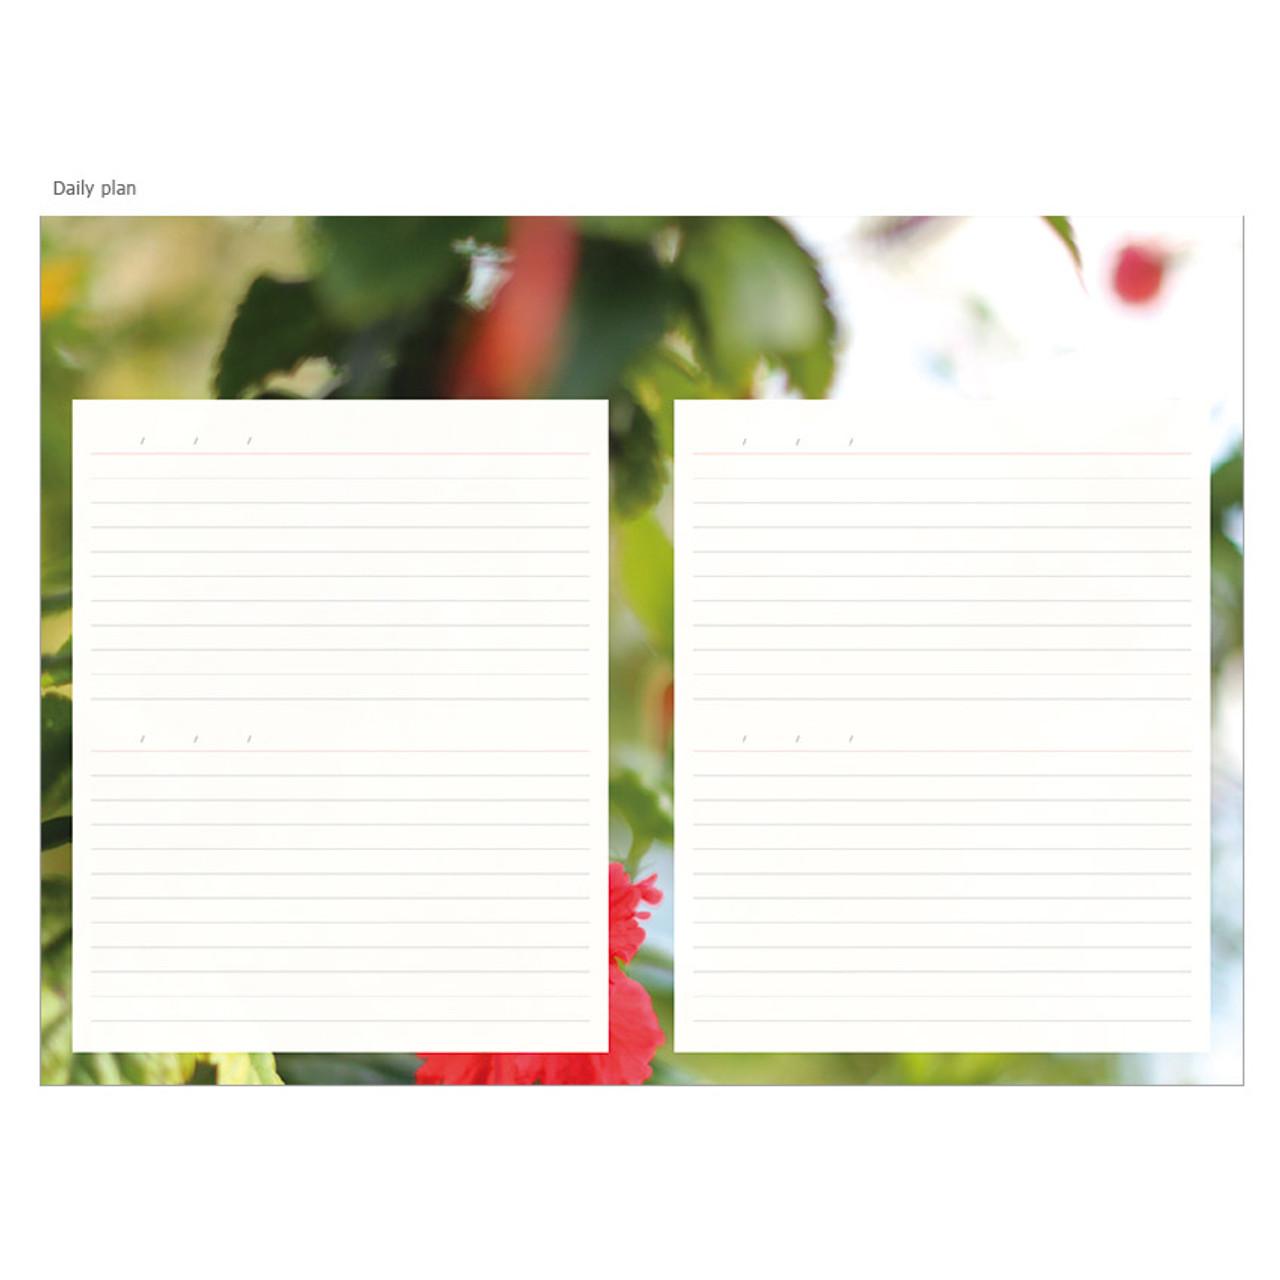 indigo my essay photography undated daily diary planner fallindesign